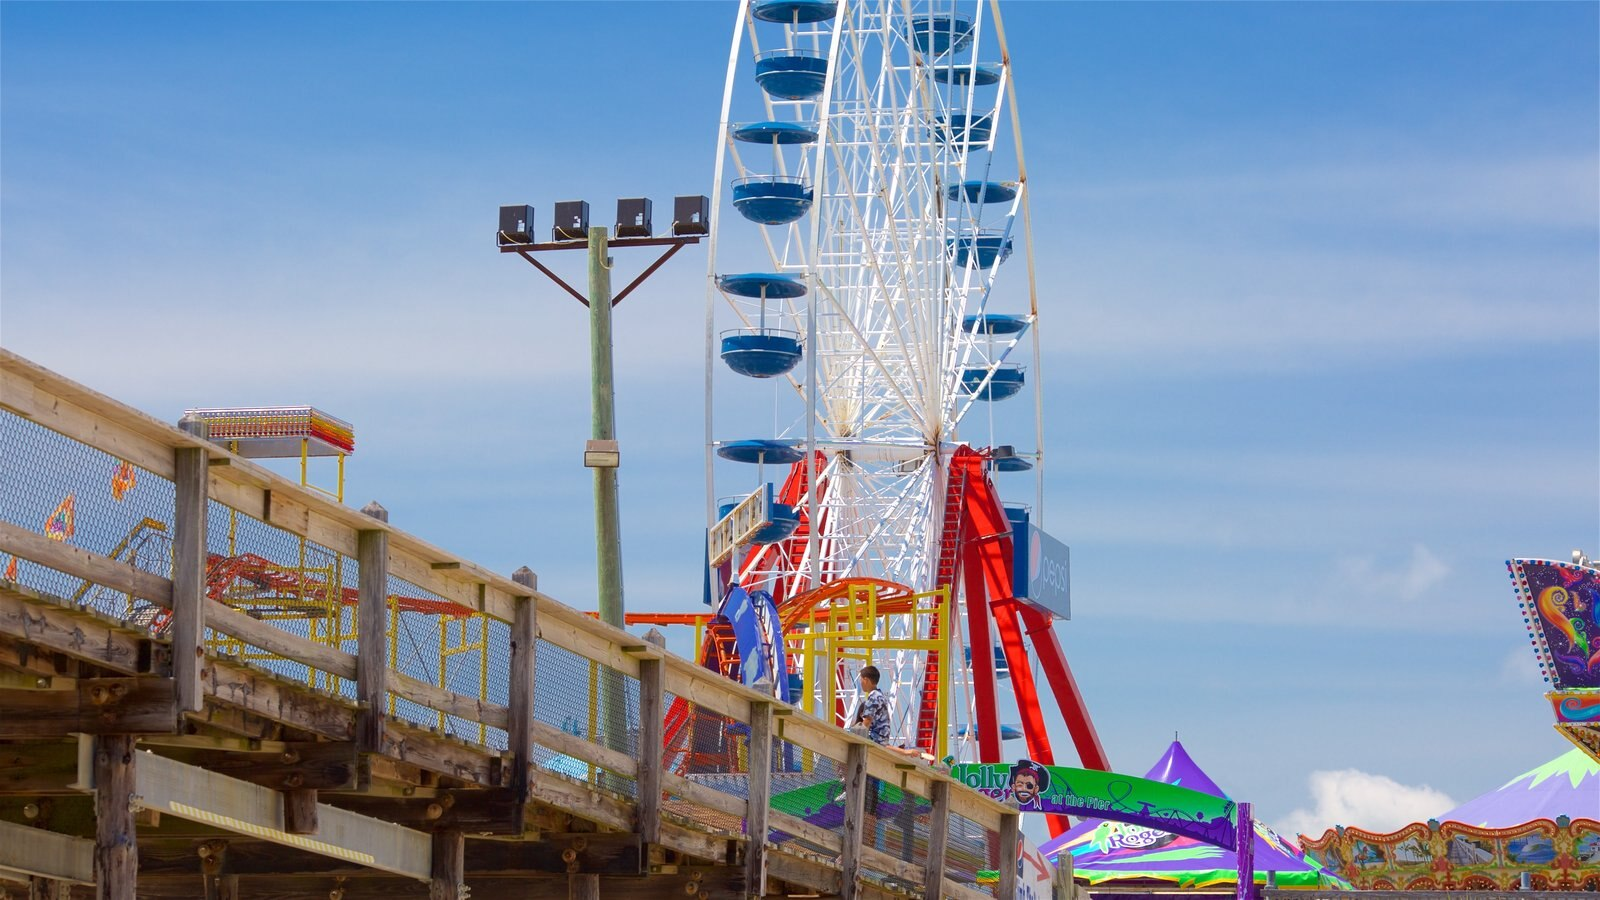 Ocean City Beach showing rides